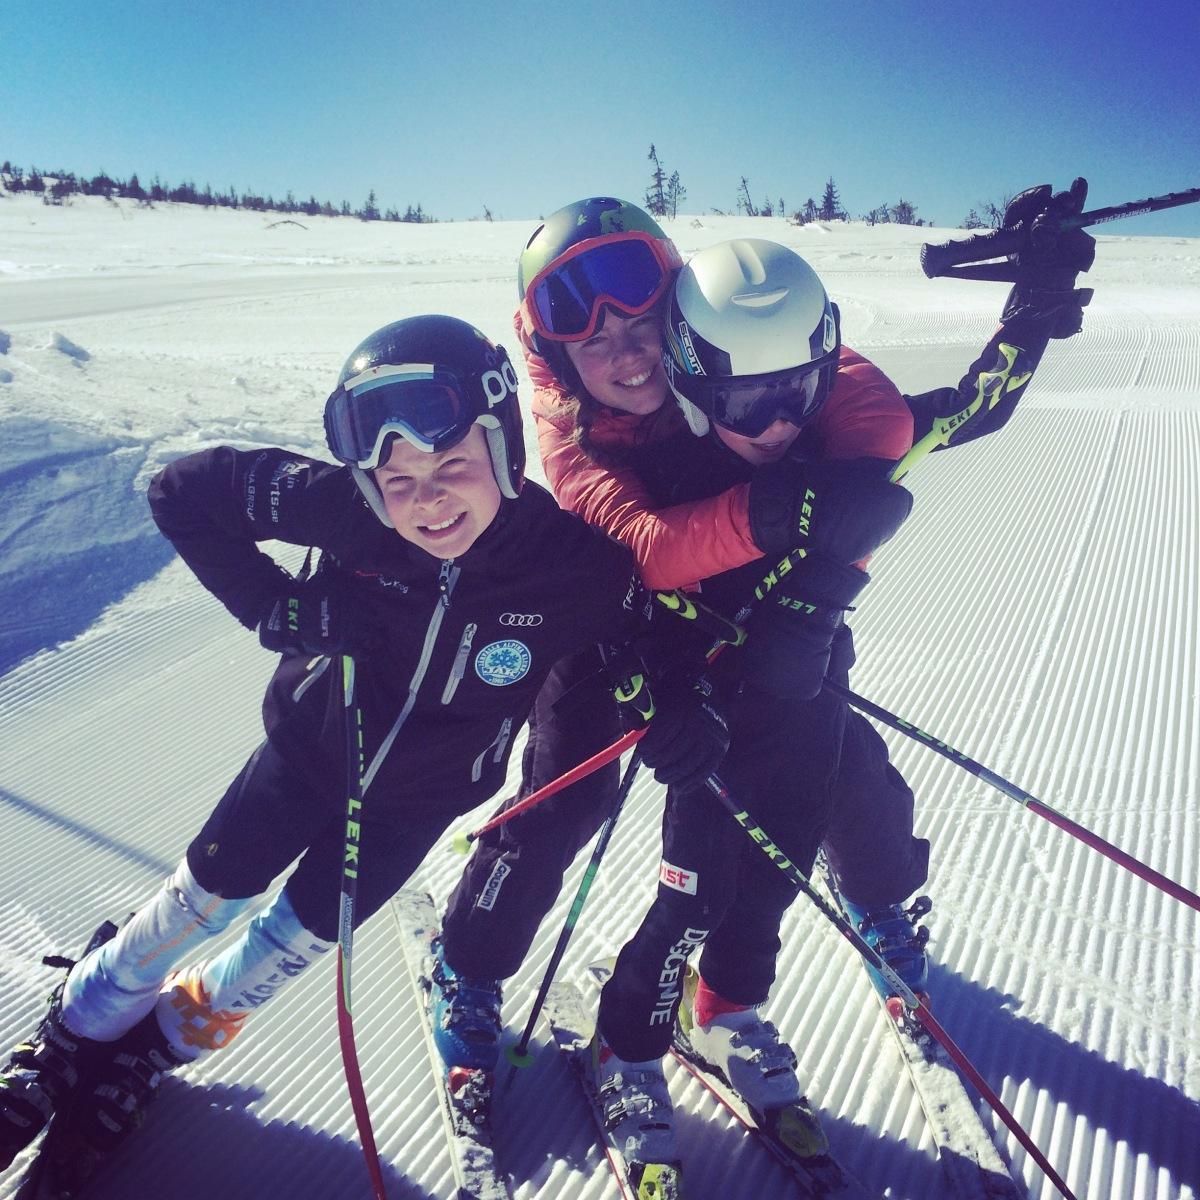 Om Slalommamman